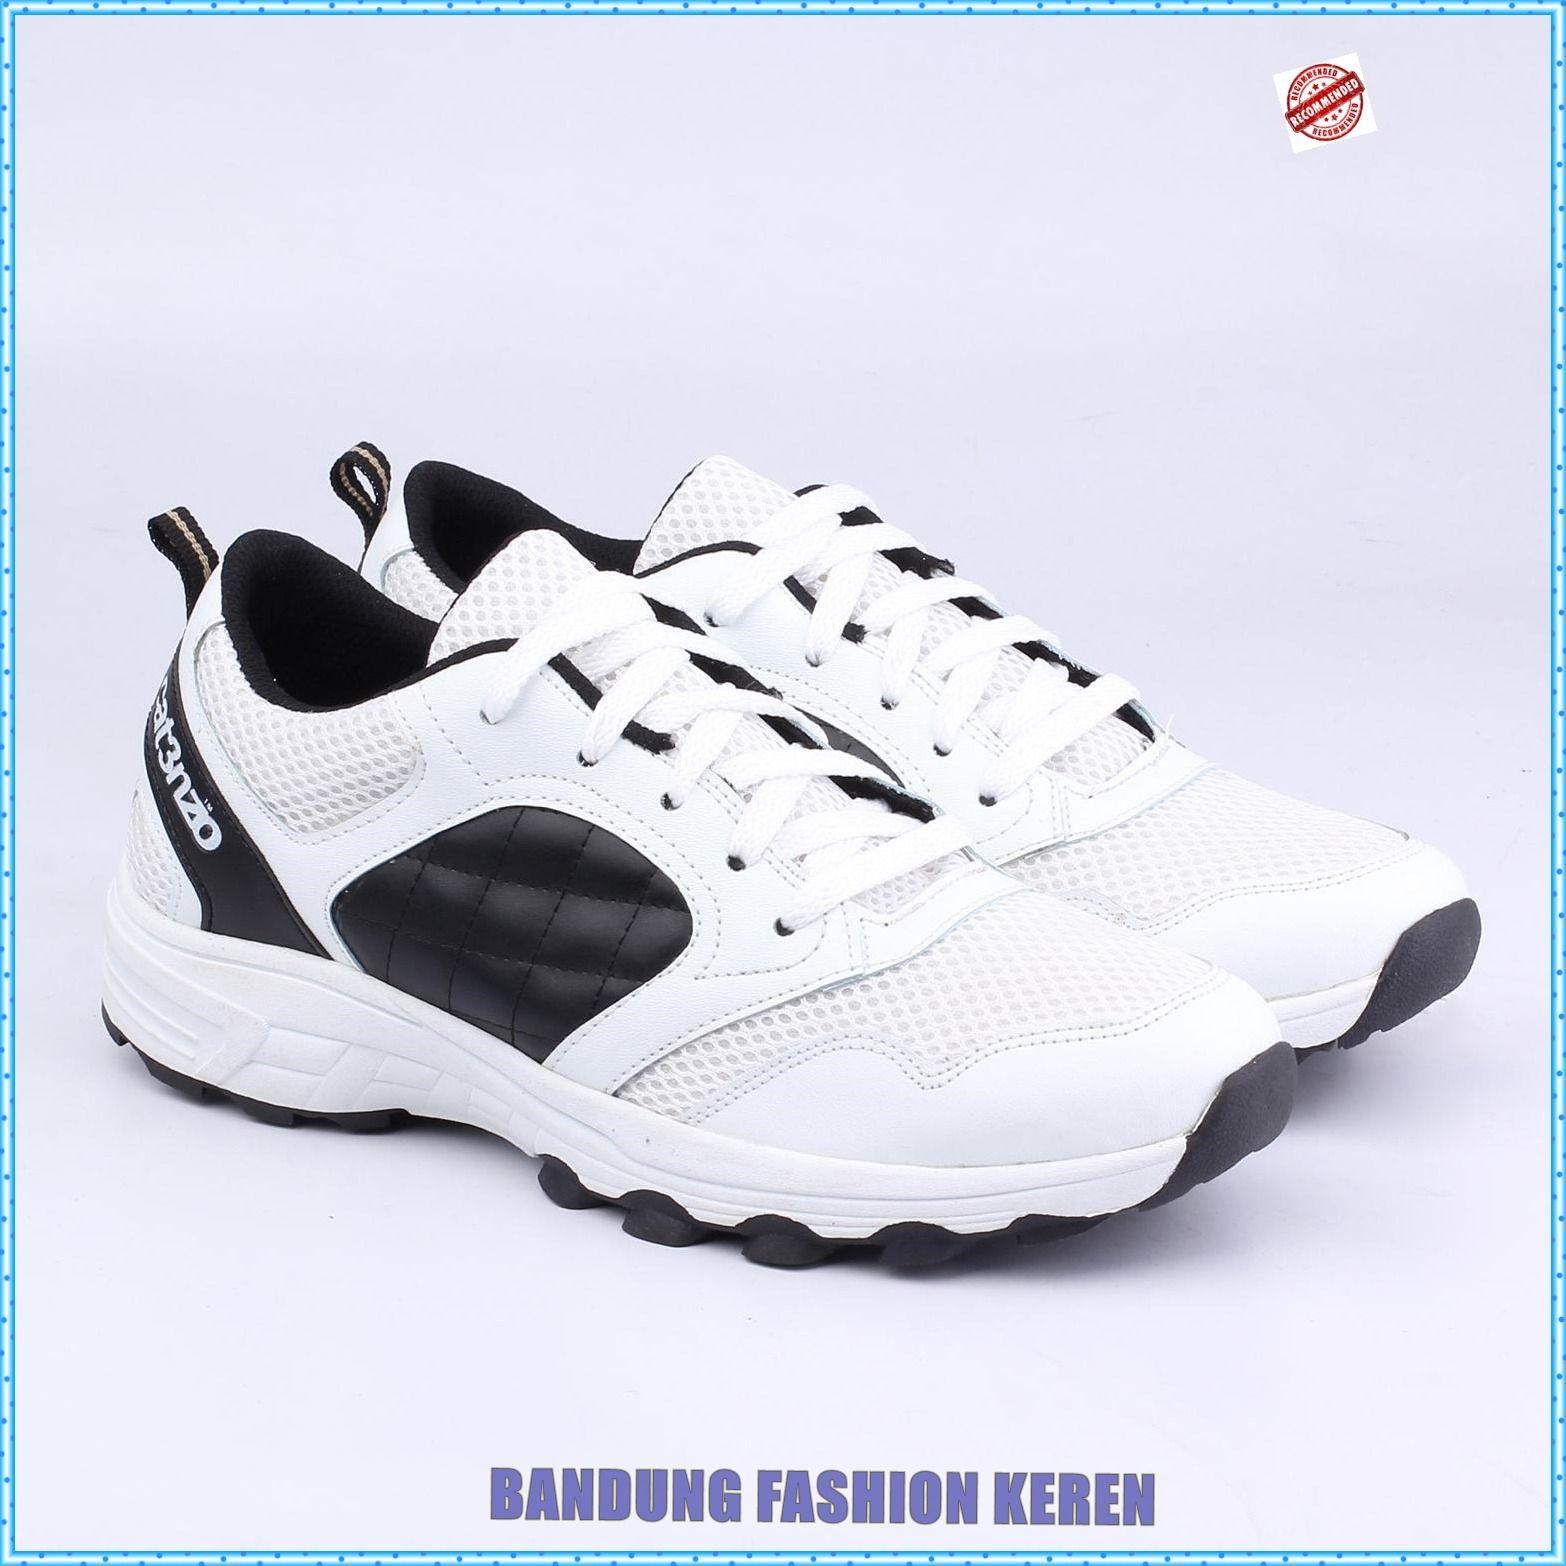 Sepatu Sport Pria Tf 138 Produk Fashion Handmade Terbaik 100